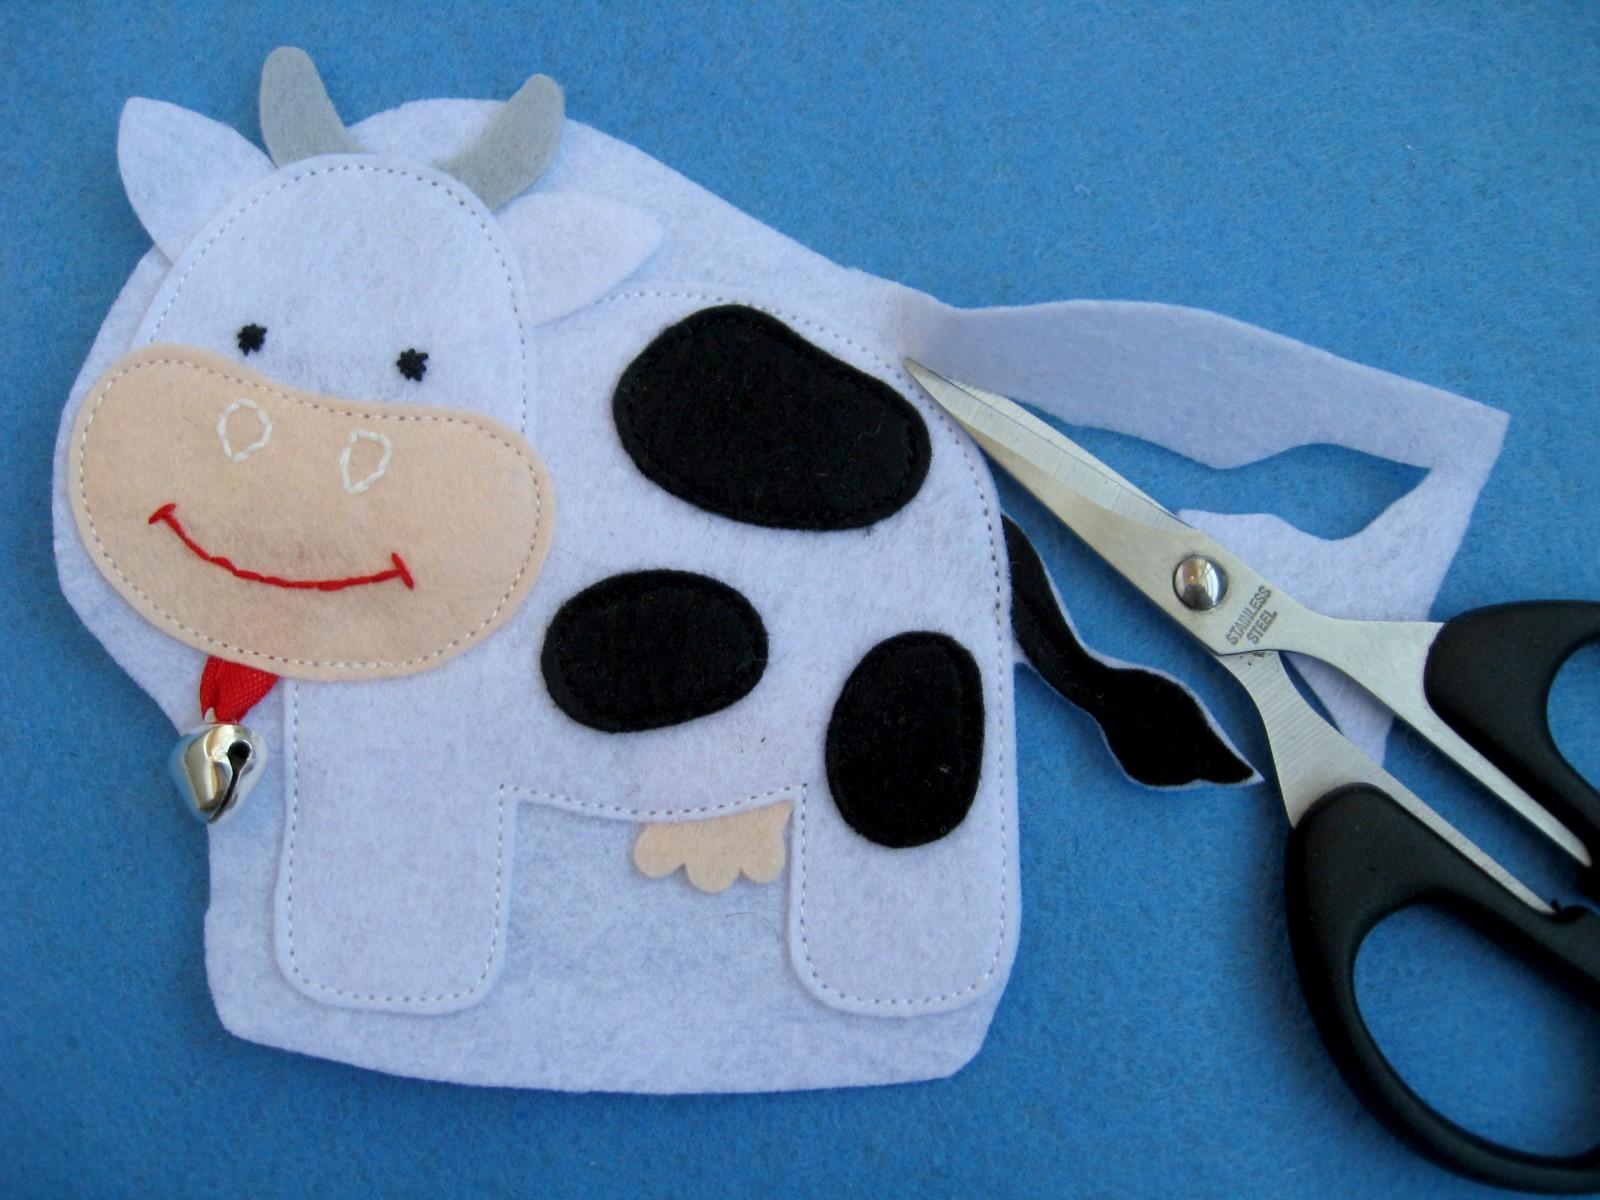 мастер-класс корова домашние животные из фетра